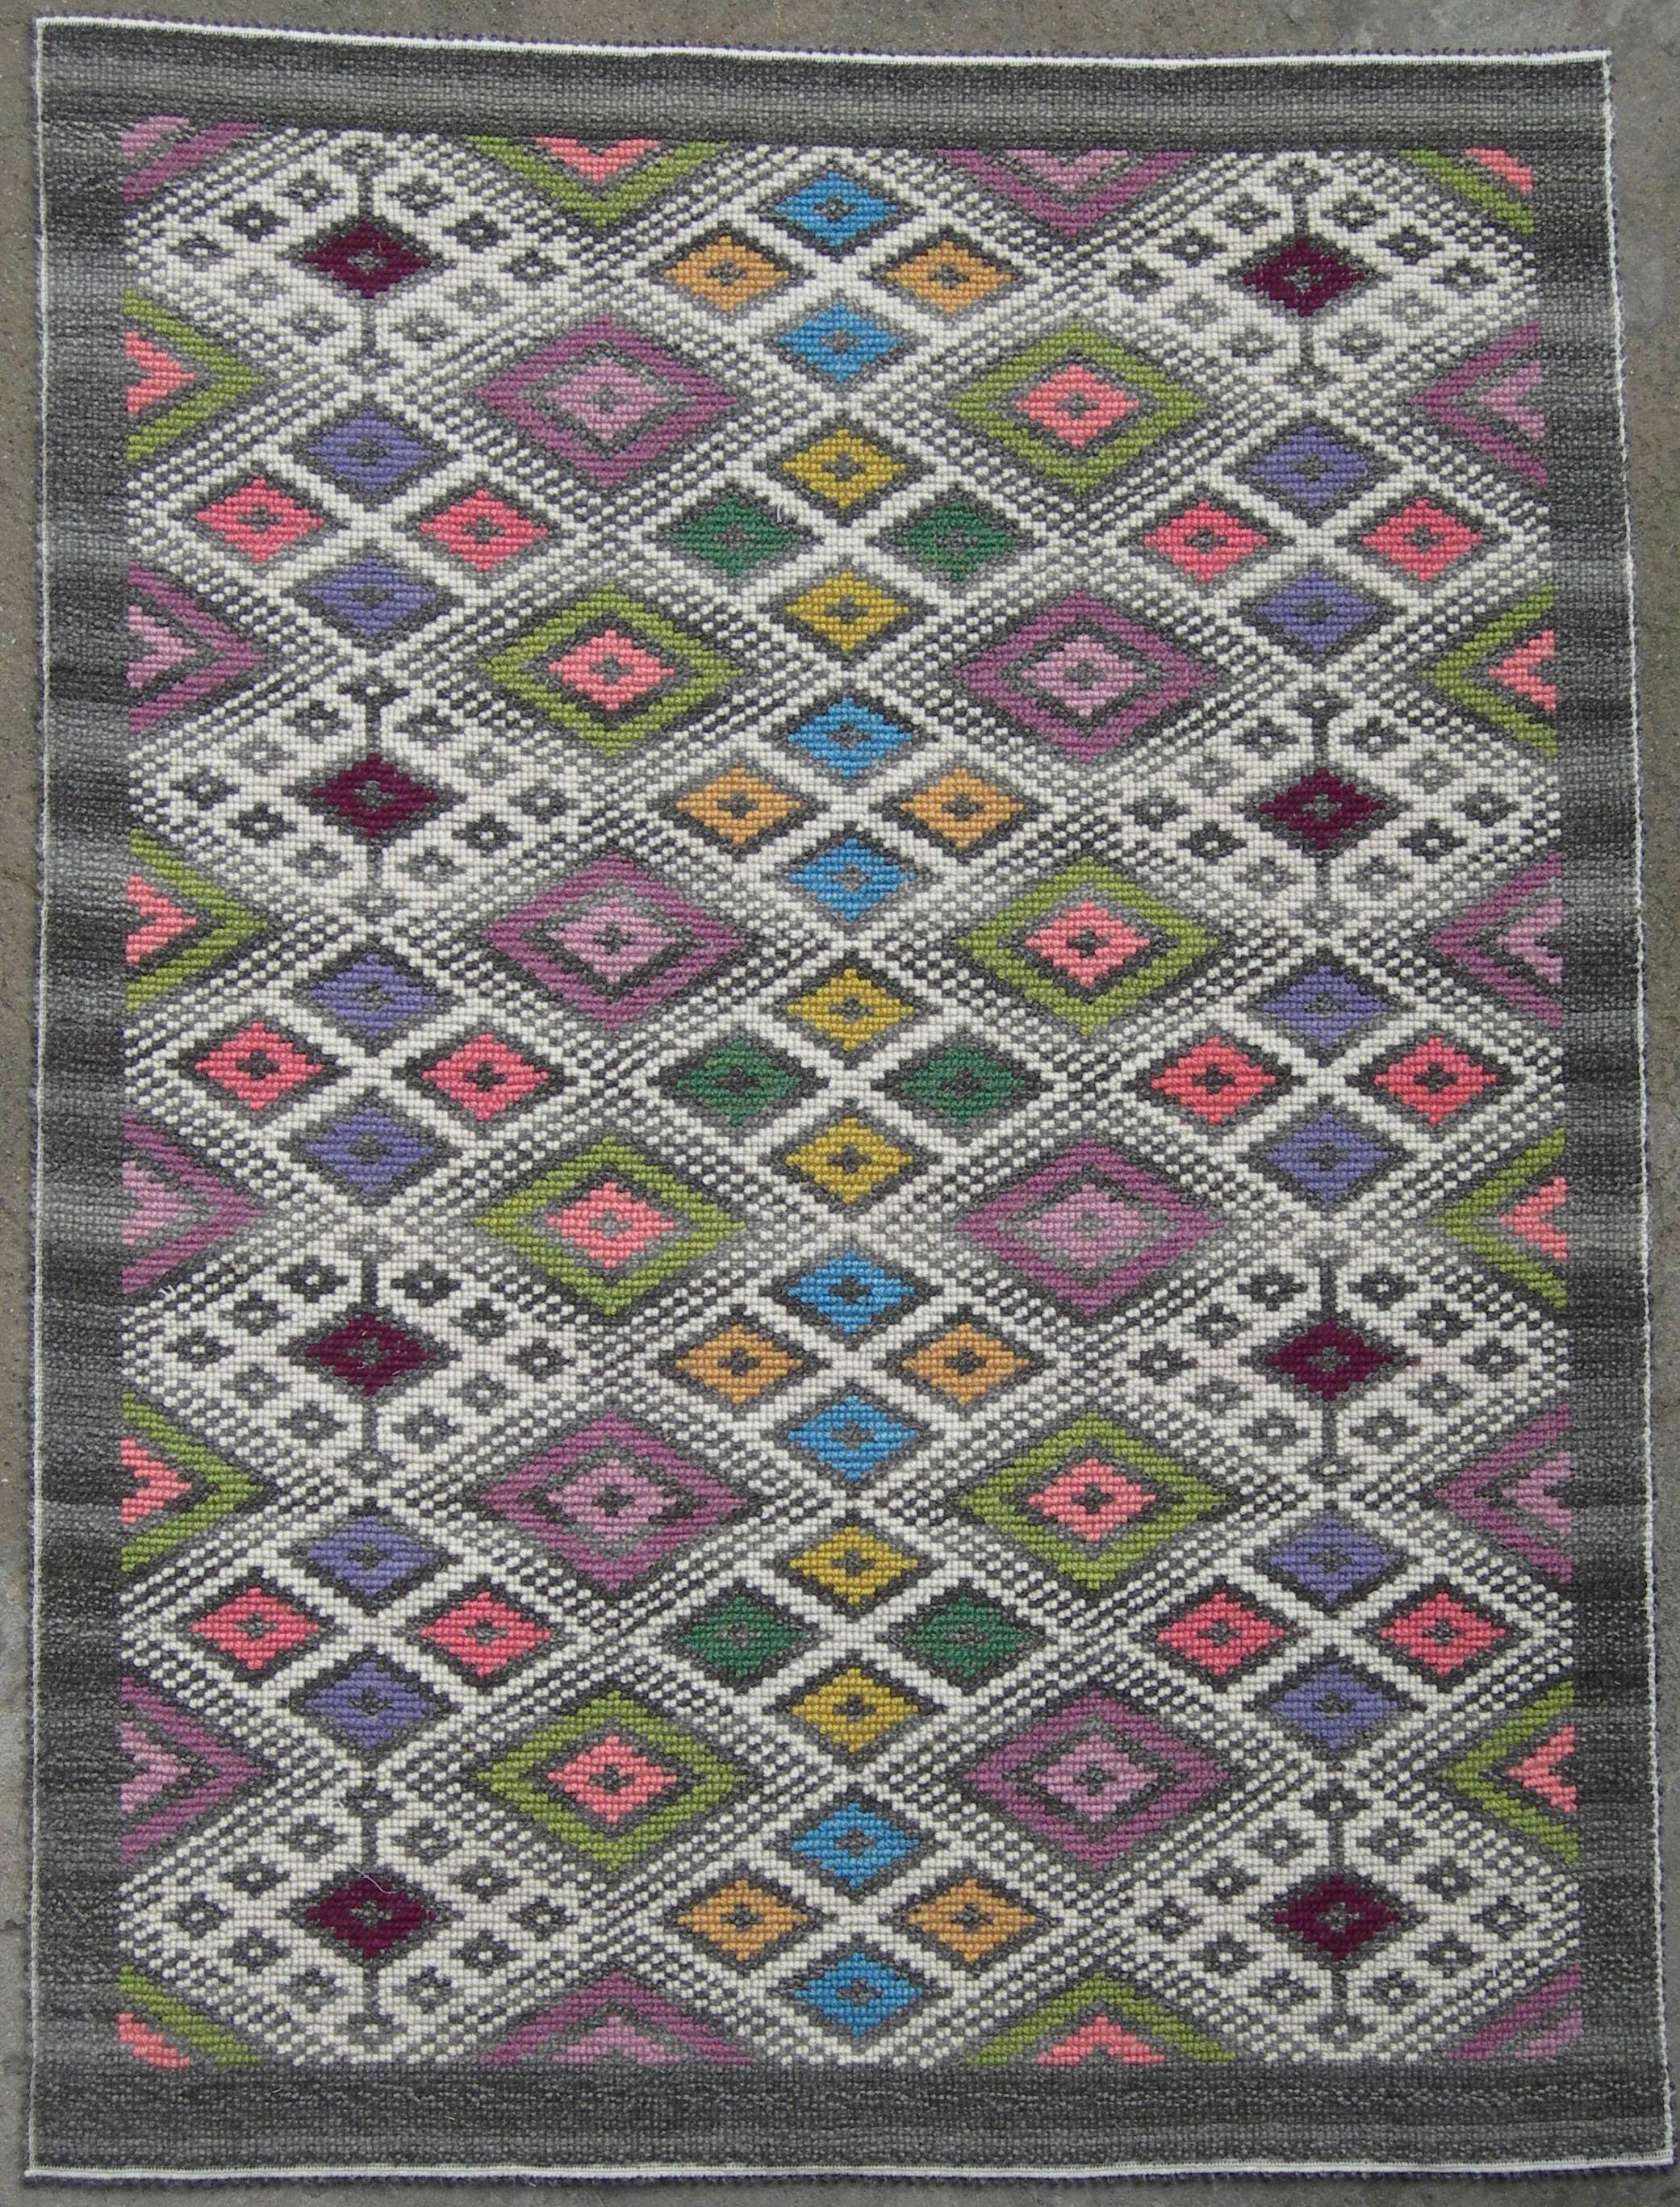 Tappeti colorati moderni 28 images tappeti colorati - Tappeti colorati ...